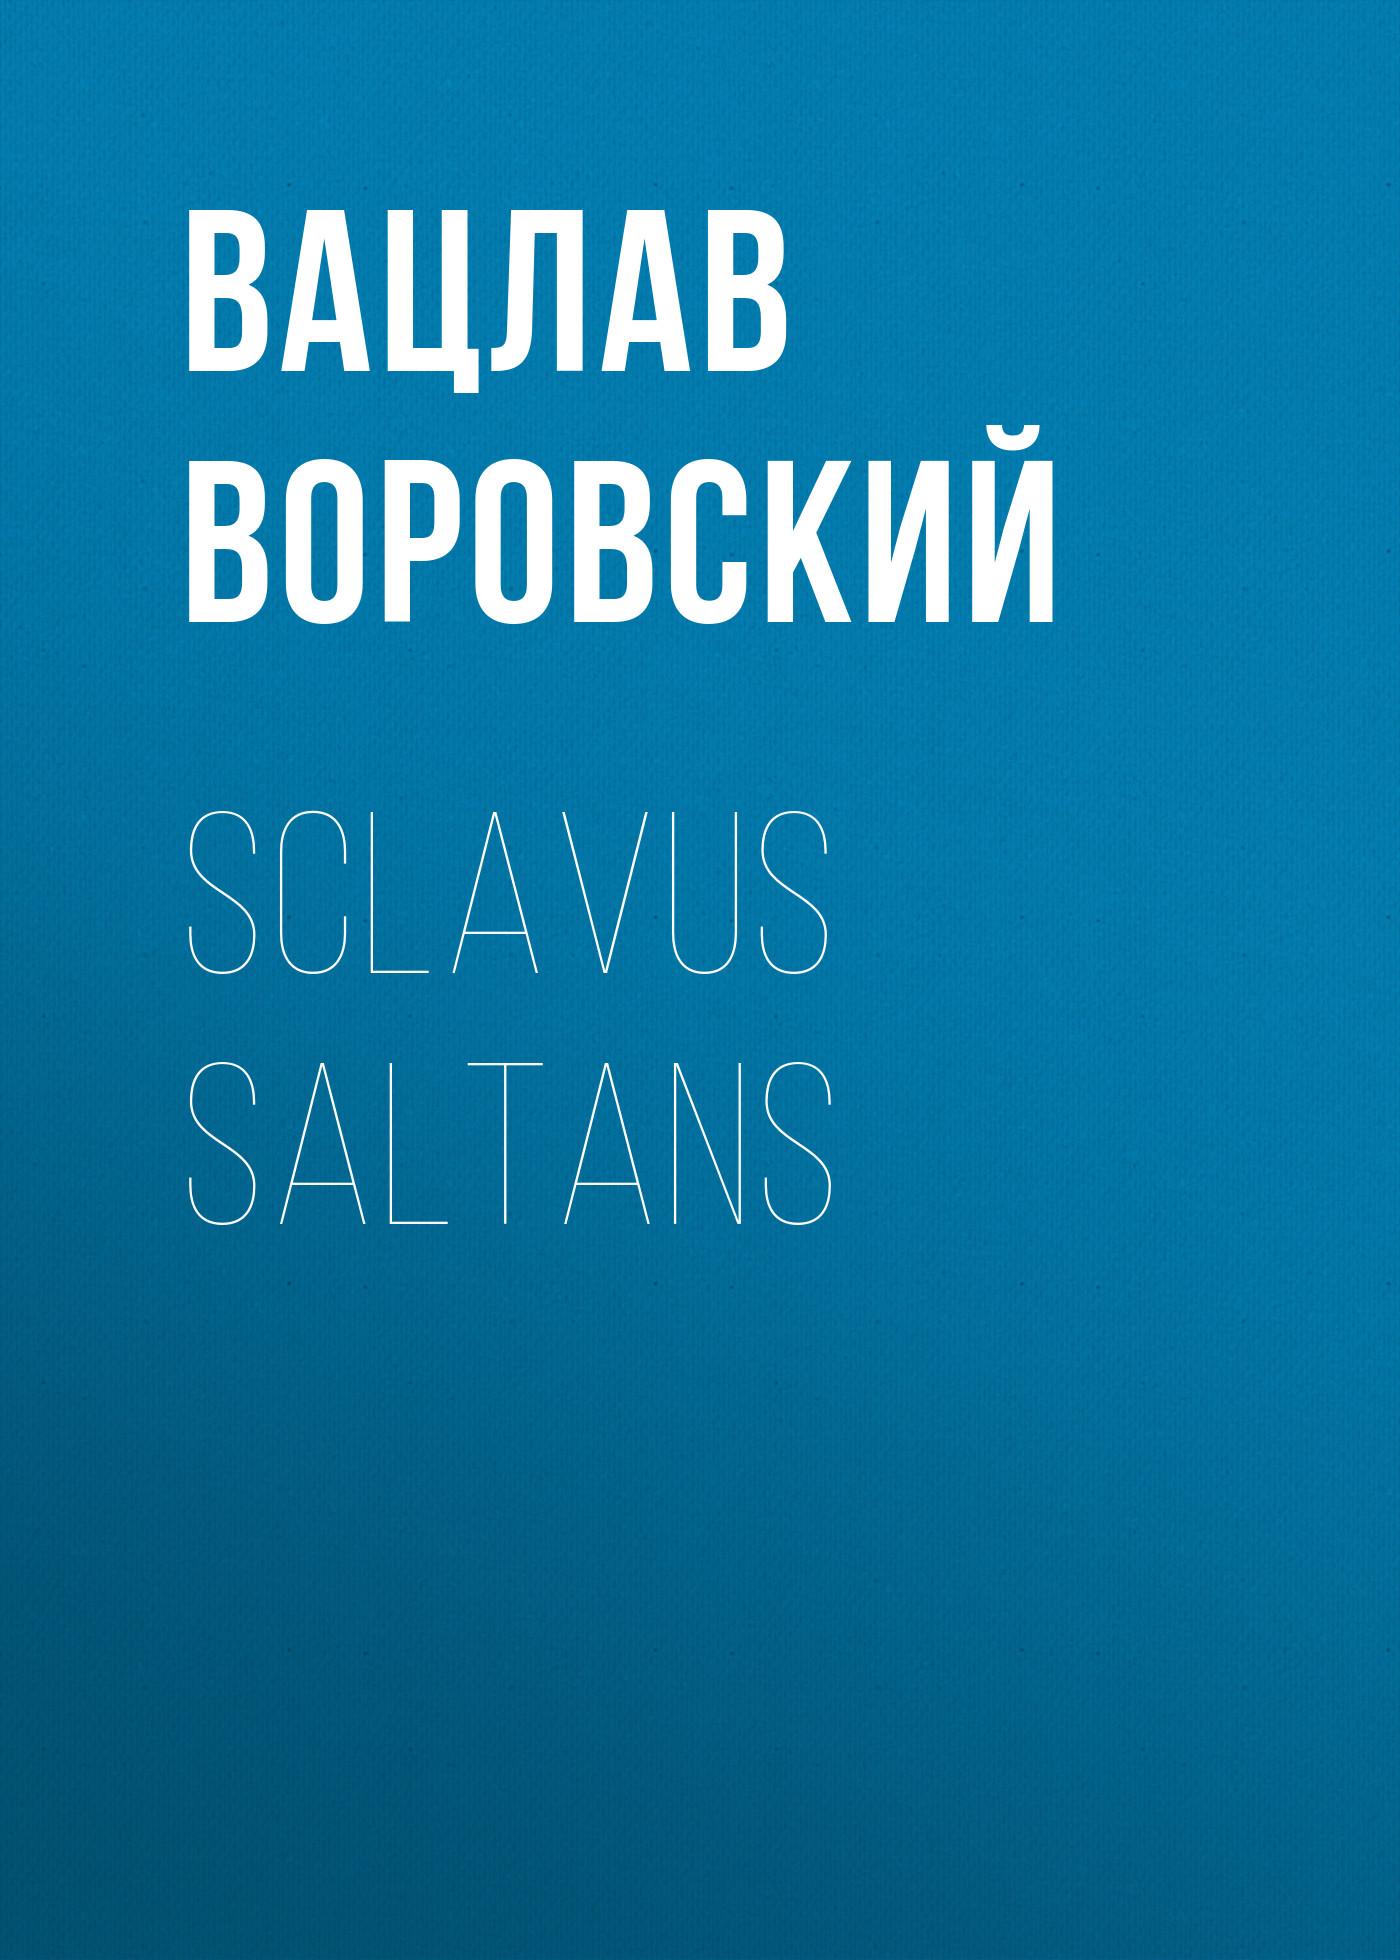 Вацлав Воровский Sclavus saltans